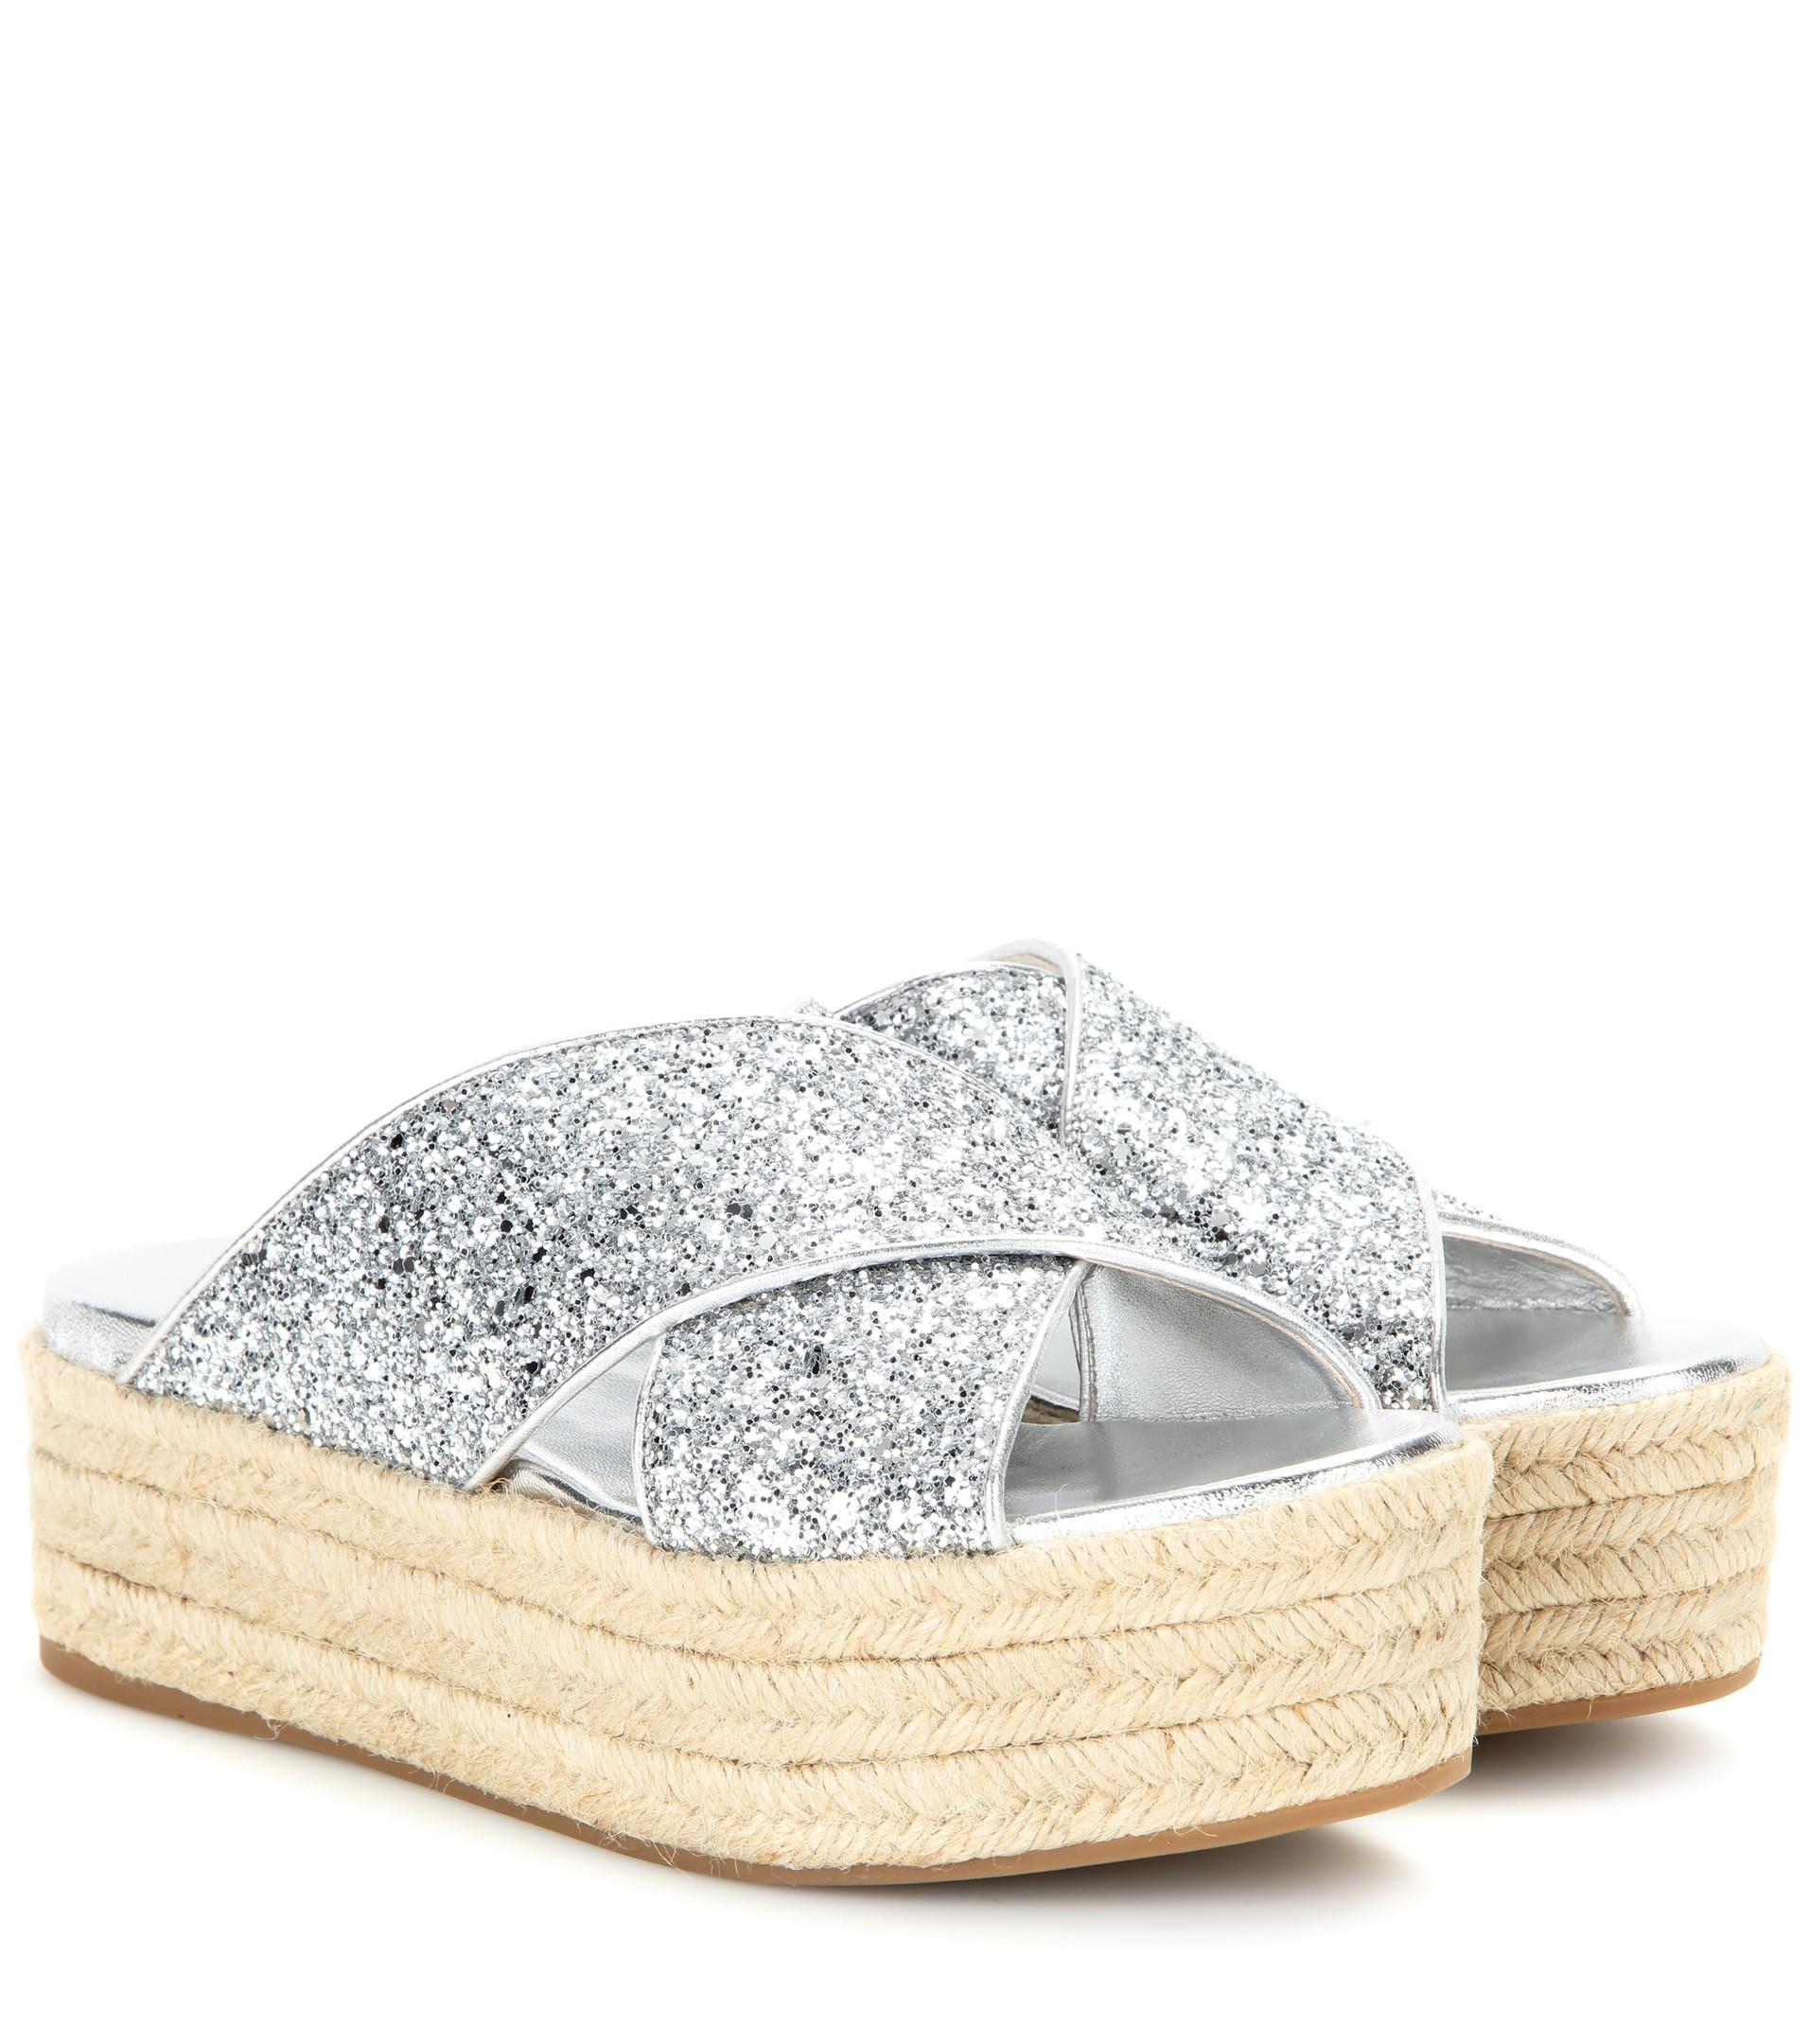 0f1216005ac Lyst - Miu Miu Glitter Platform Sandals in Blue